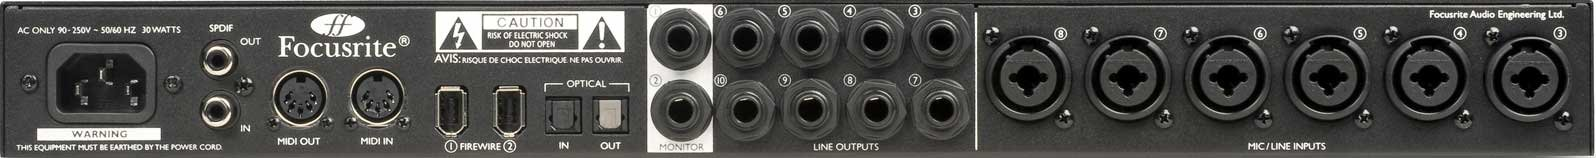 20 x 20 Firewire Audio Interface